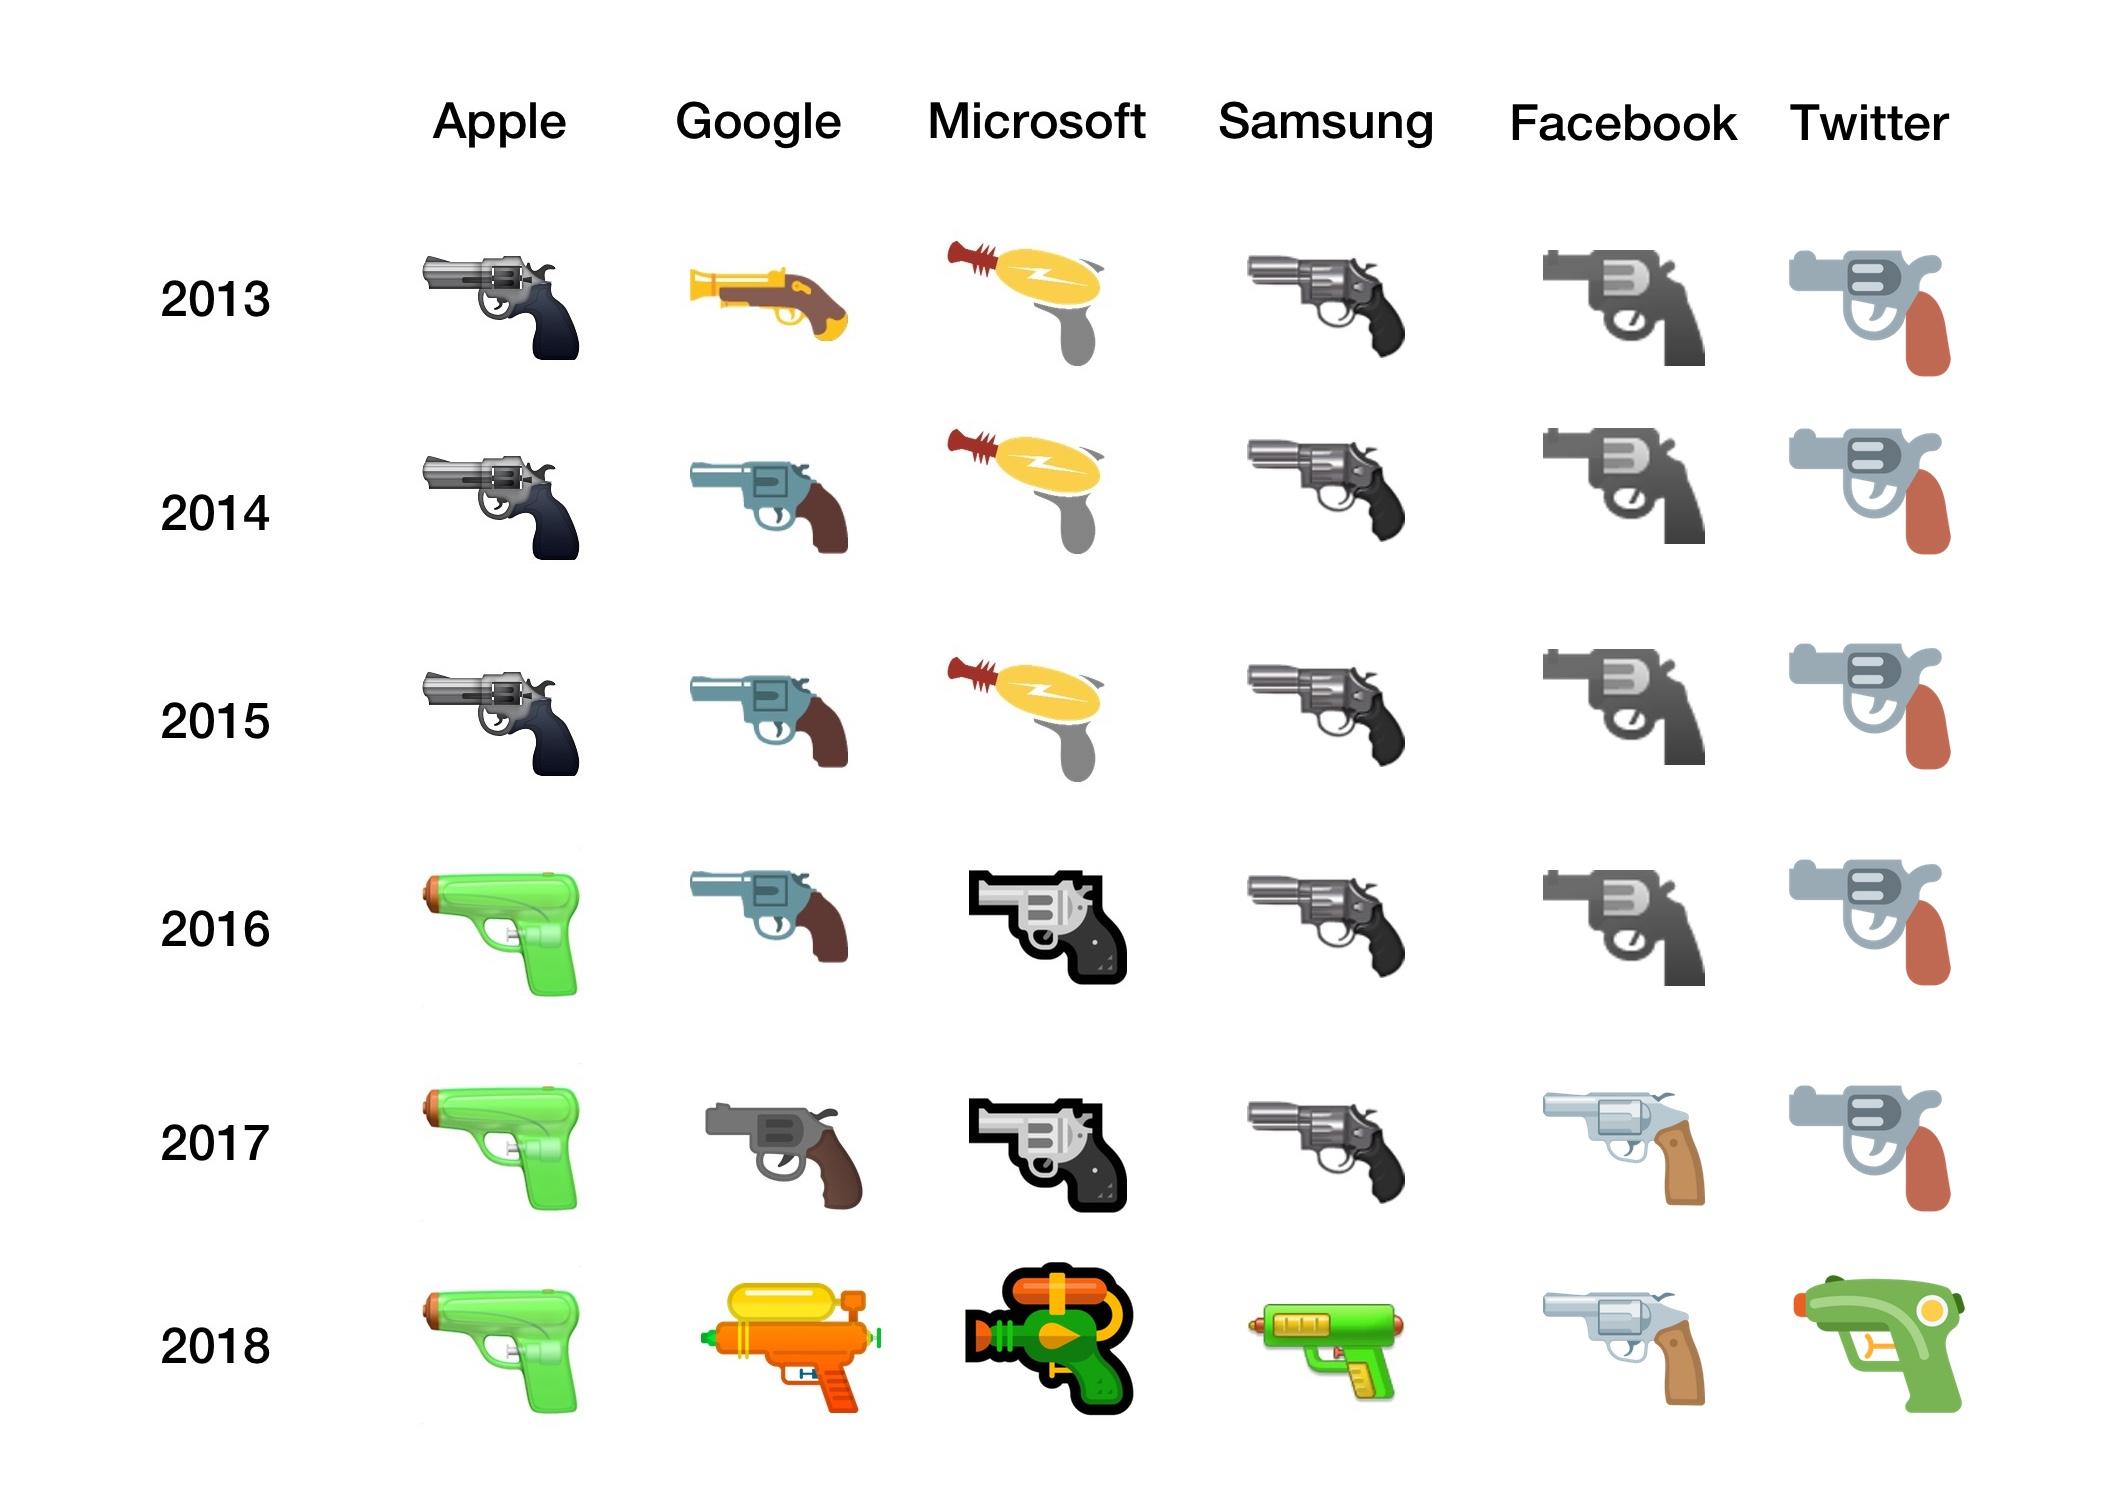 pistol-emoji-comparison-image-emojipedia-2018-update-1